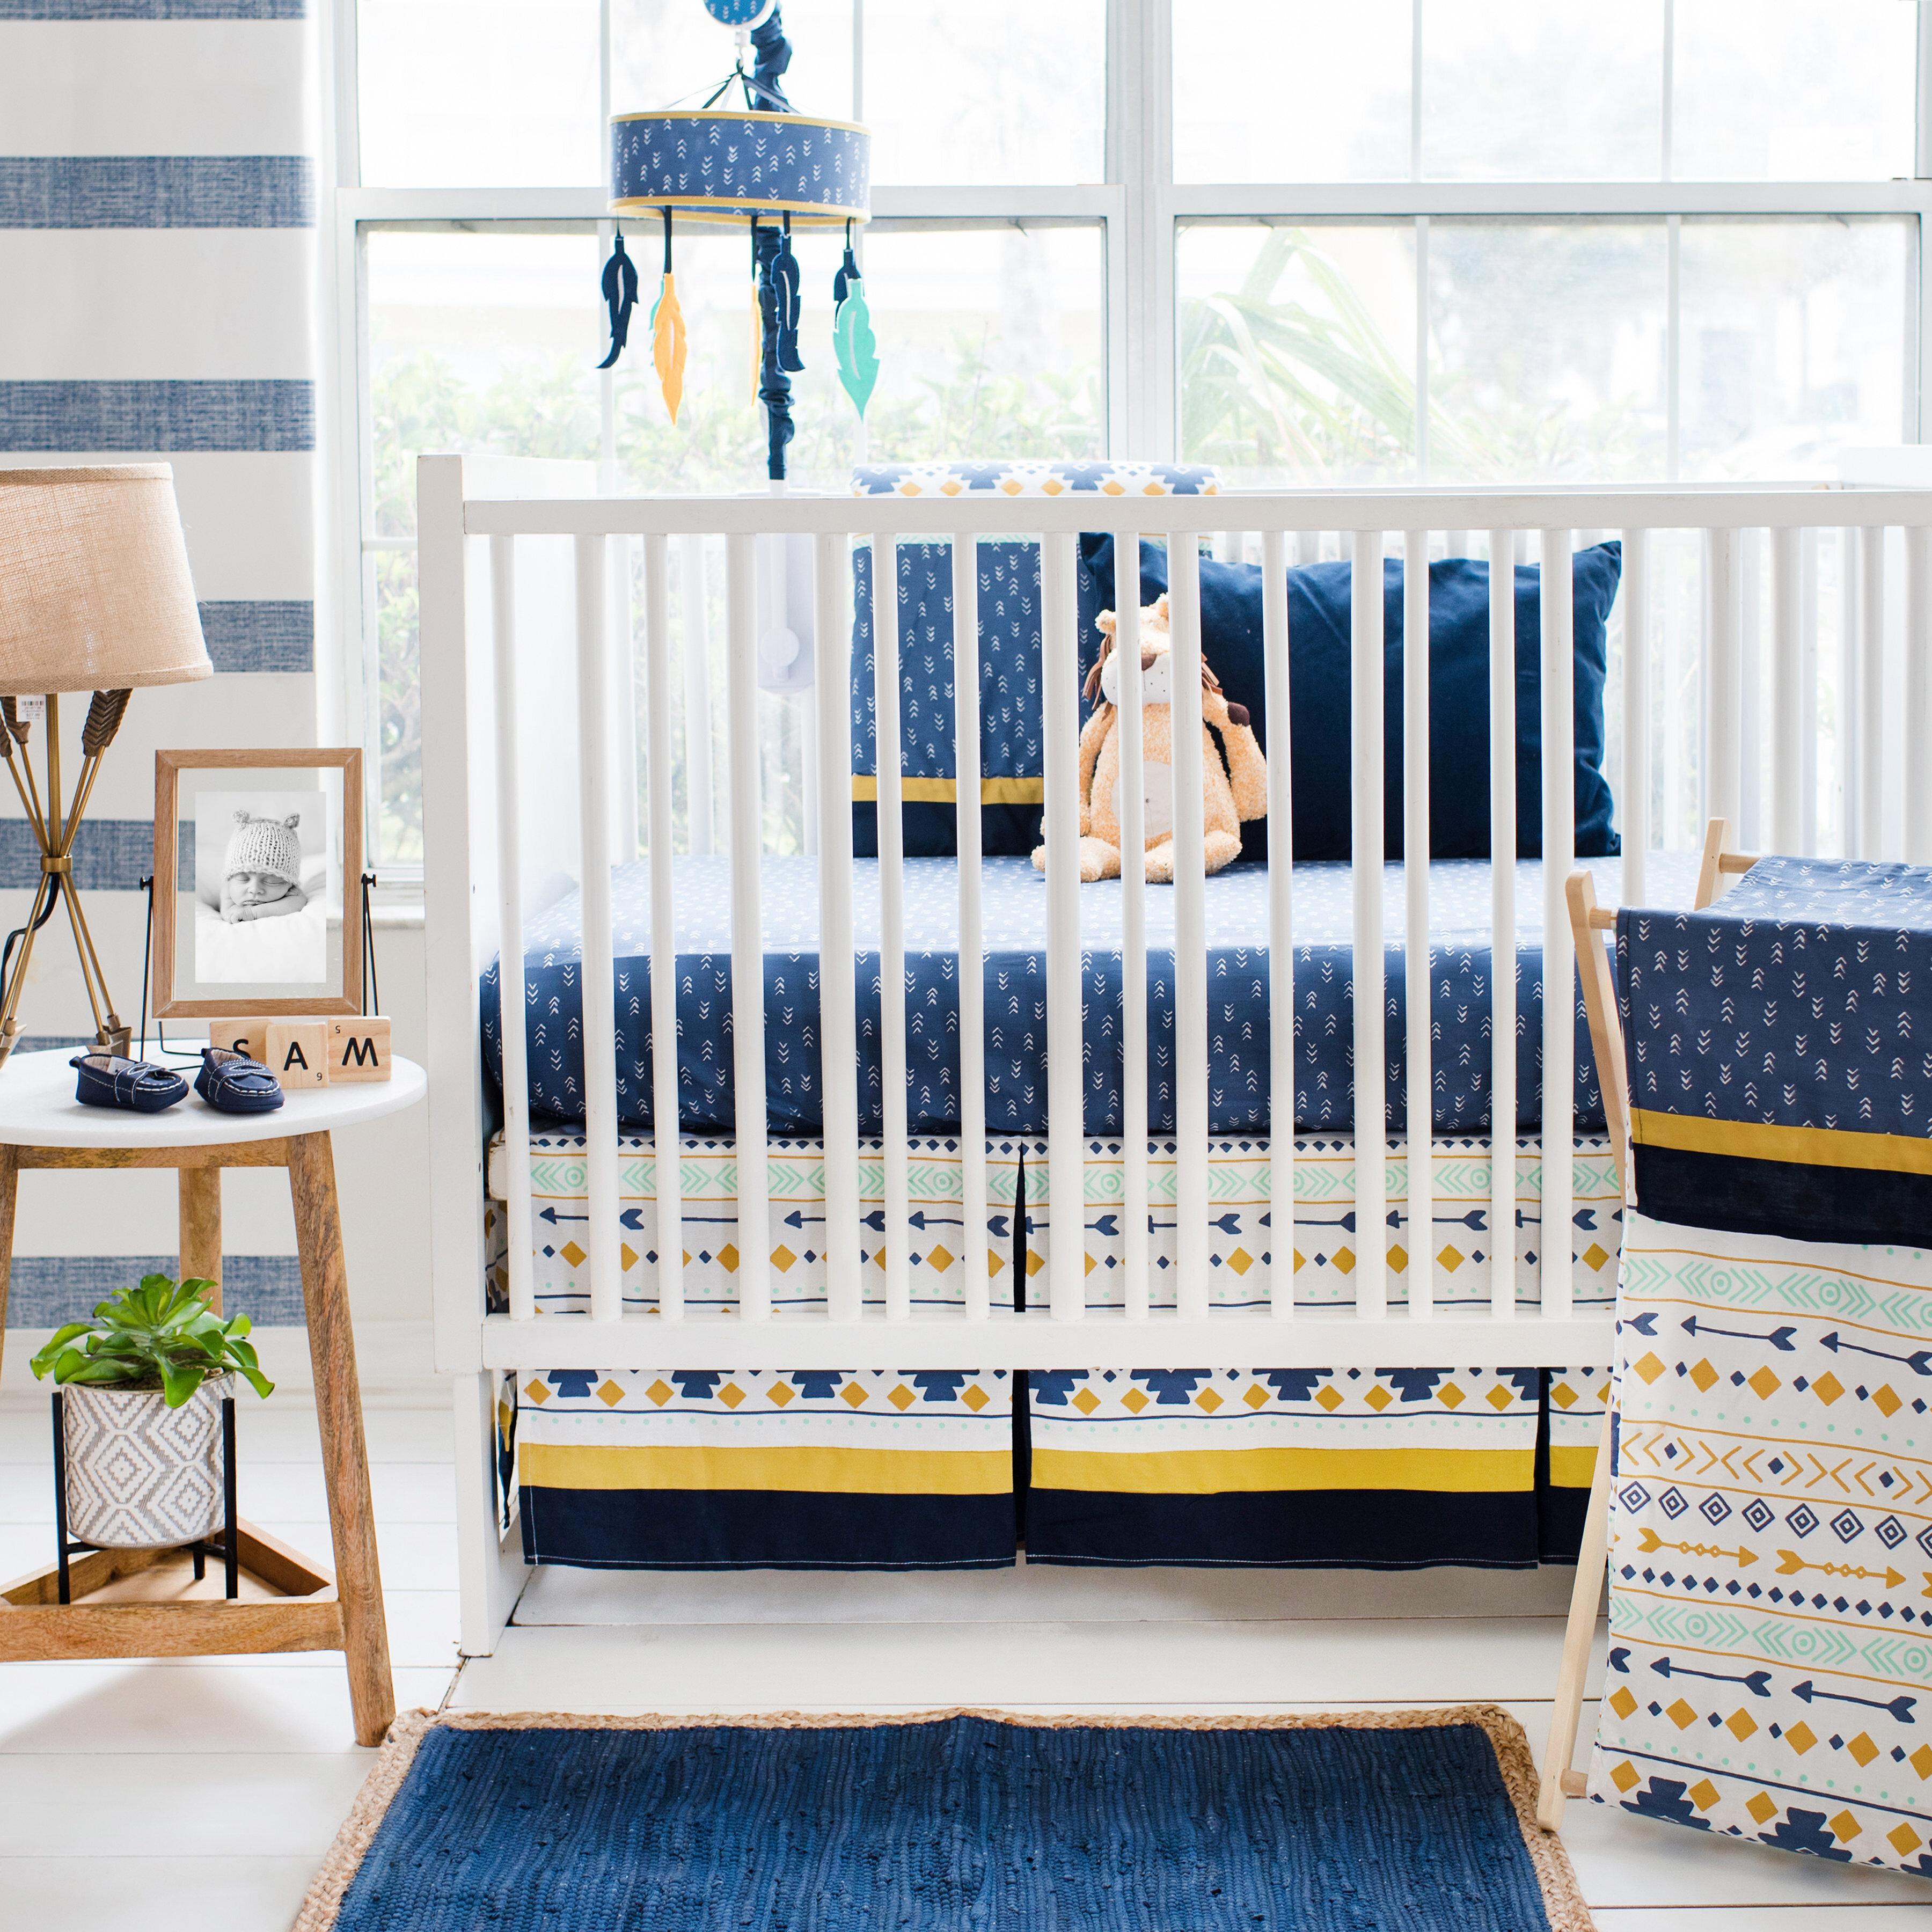 a00463fce0c3 Harriet Bee Swindell 3 Piece Crib Bedding Set   Reviews